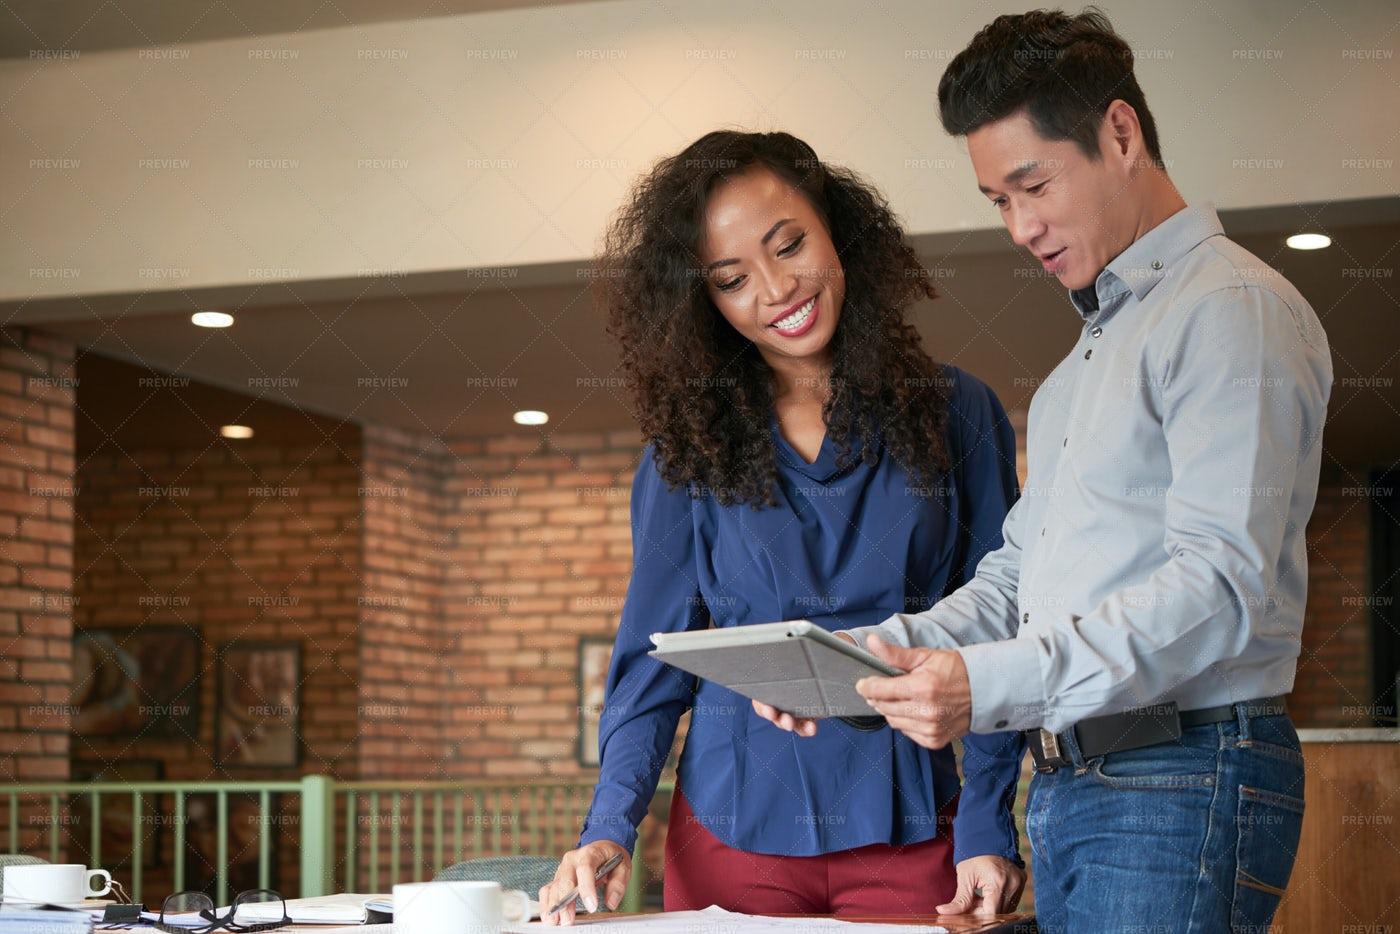 Analyzing Data On Digital Tablet: Stock Photos